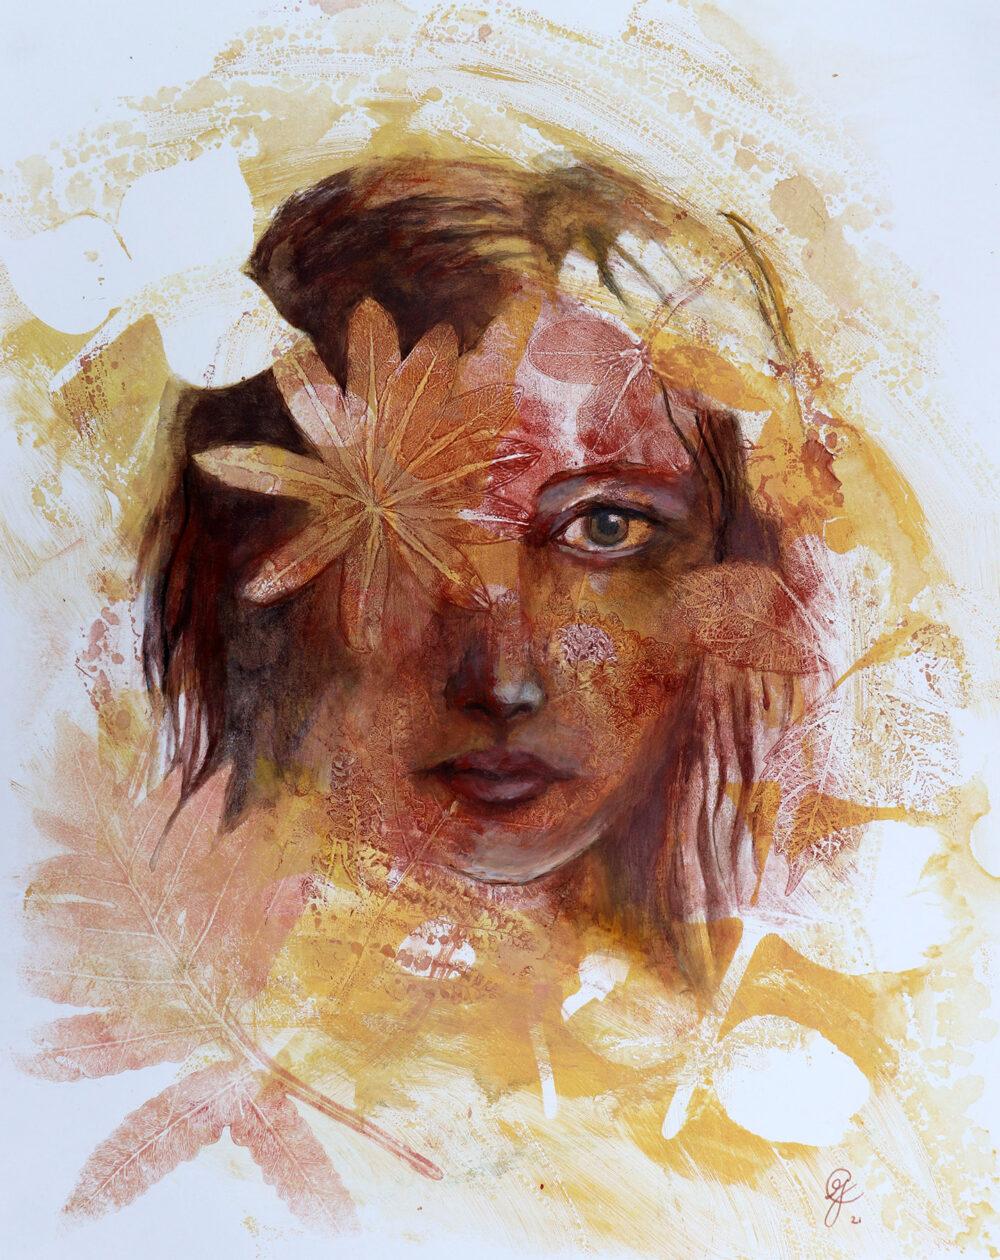 portrait-fille-fleur-artiste-peintre-carine-genadry